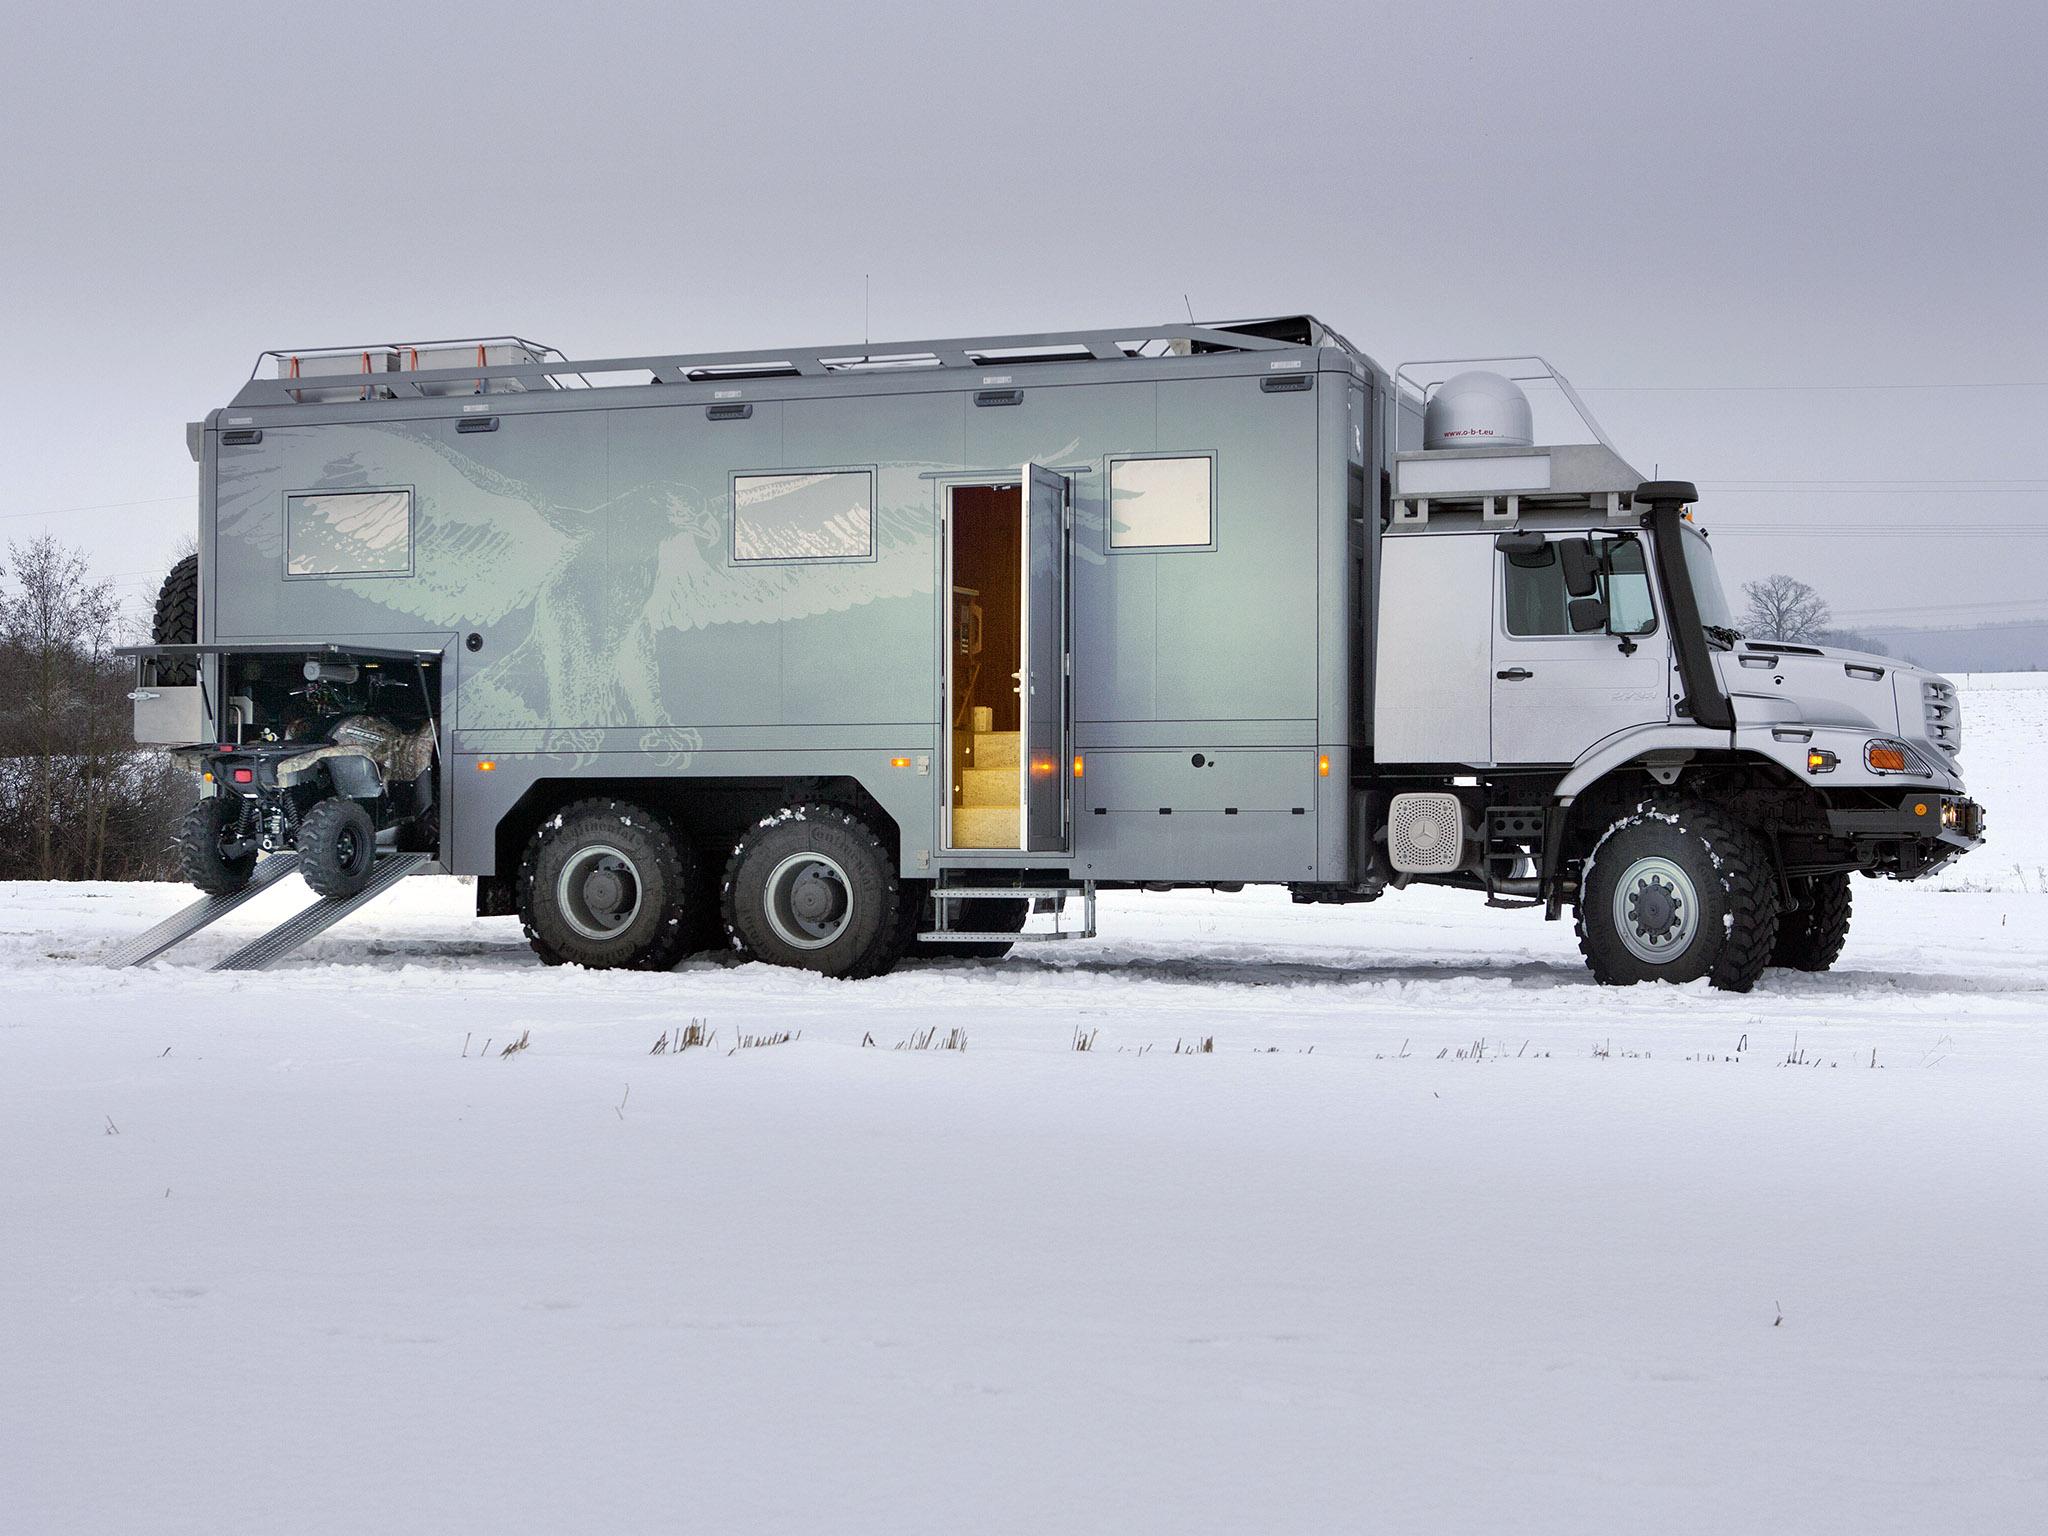 2011 mercedes benz zetros 2733a expedition vehicle 6x6 for Mercedes benz motor home